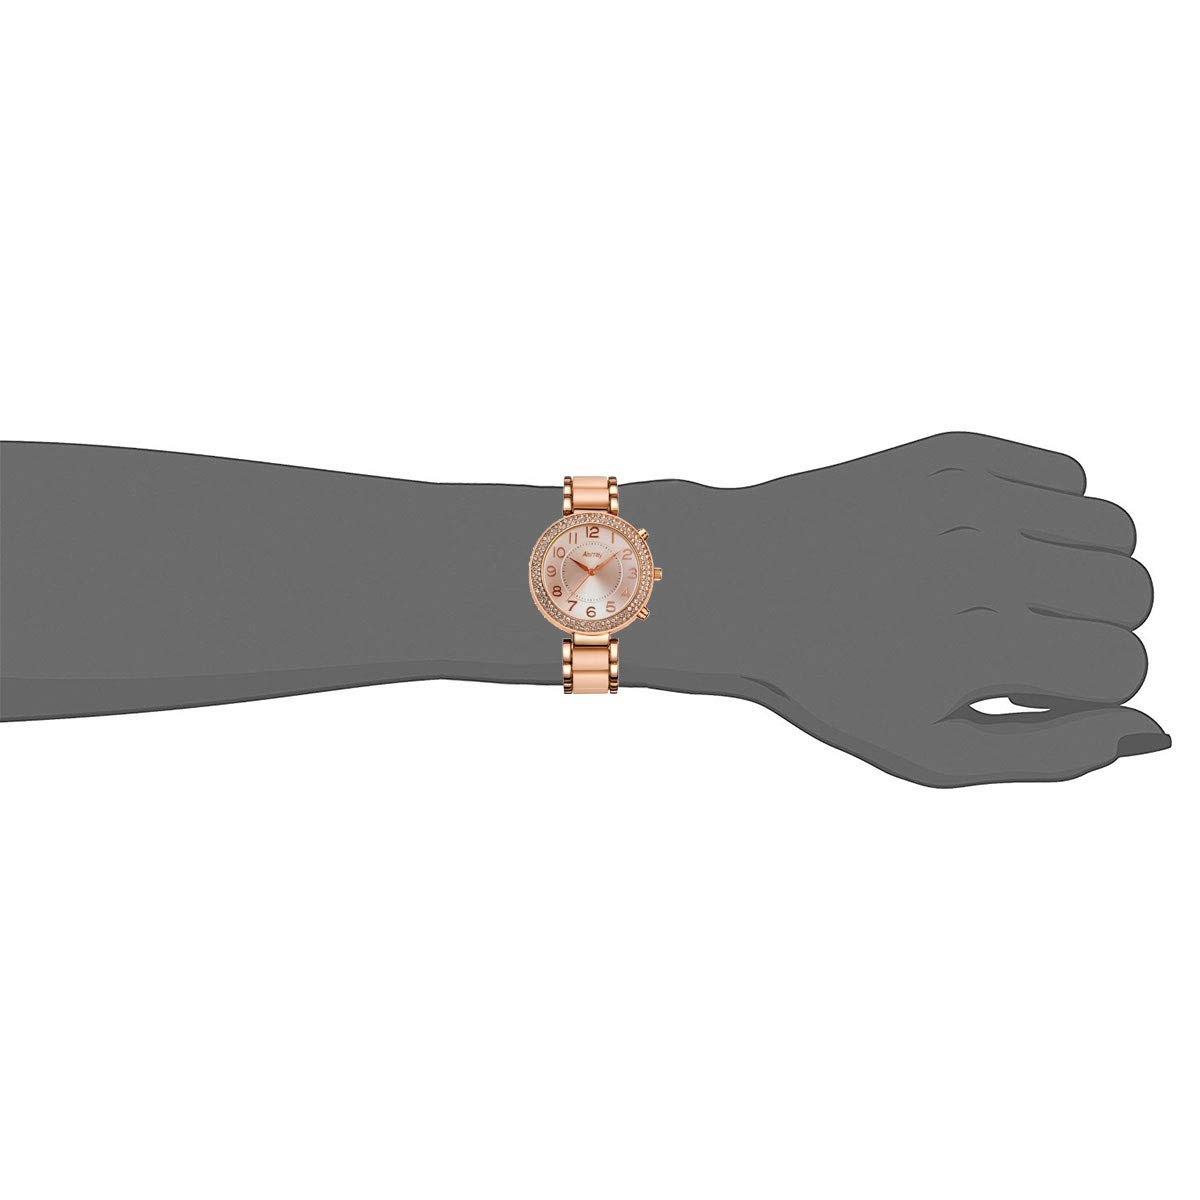 abrray analógico cuarzo Rhinestone caso tono dorado reloj de pulsera para mujer con números arábigos pantalla